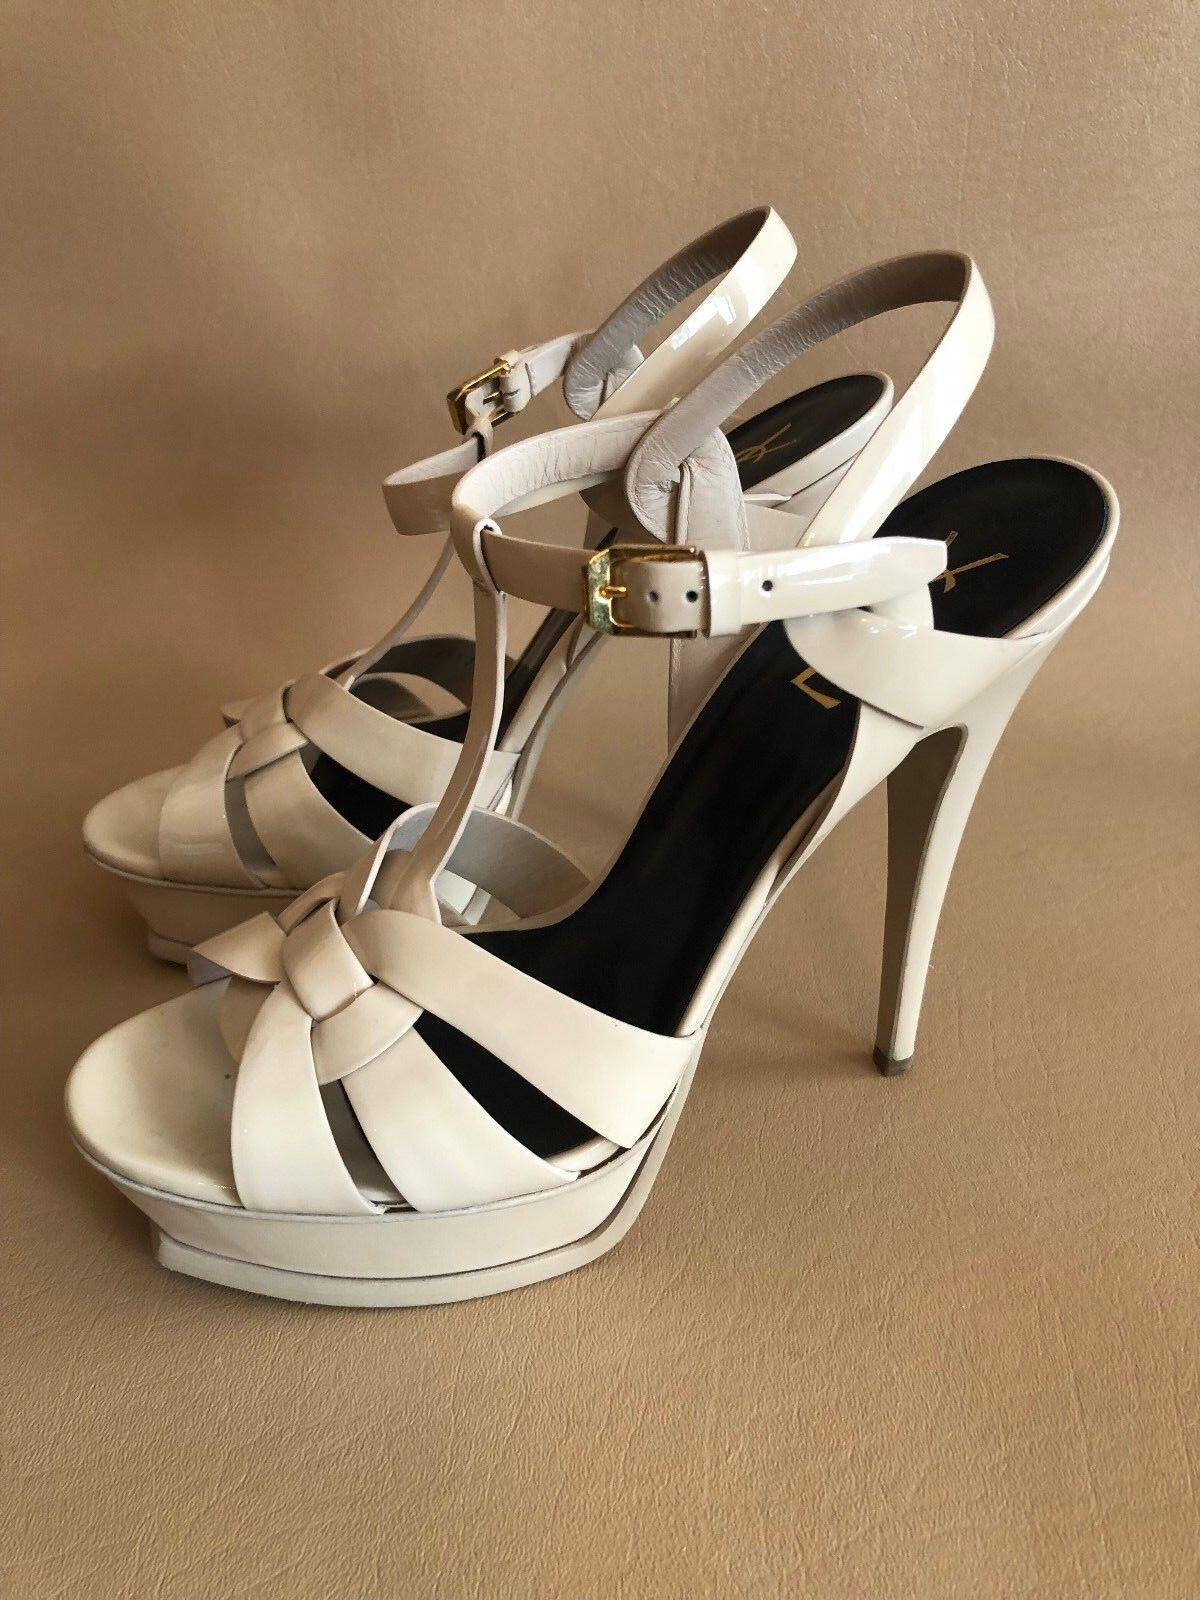 YSL Yves Saint Laurent Tribute T-Strap Platform Sandal Size 41